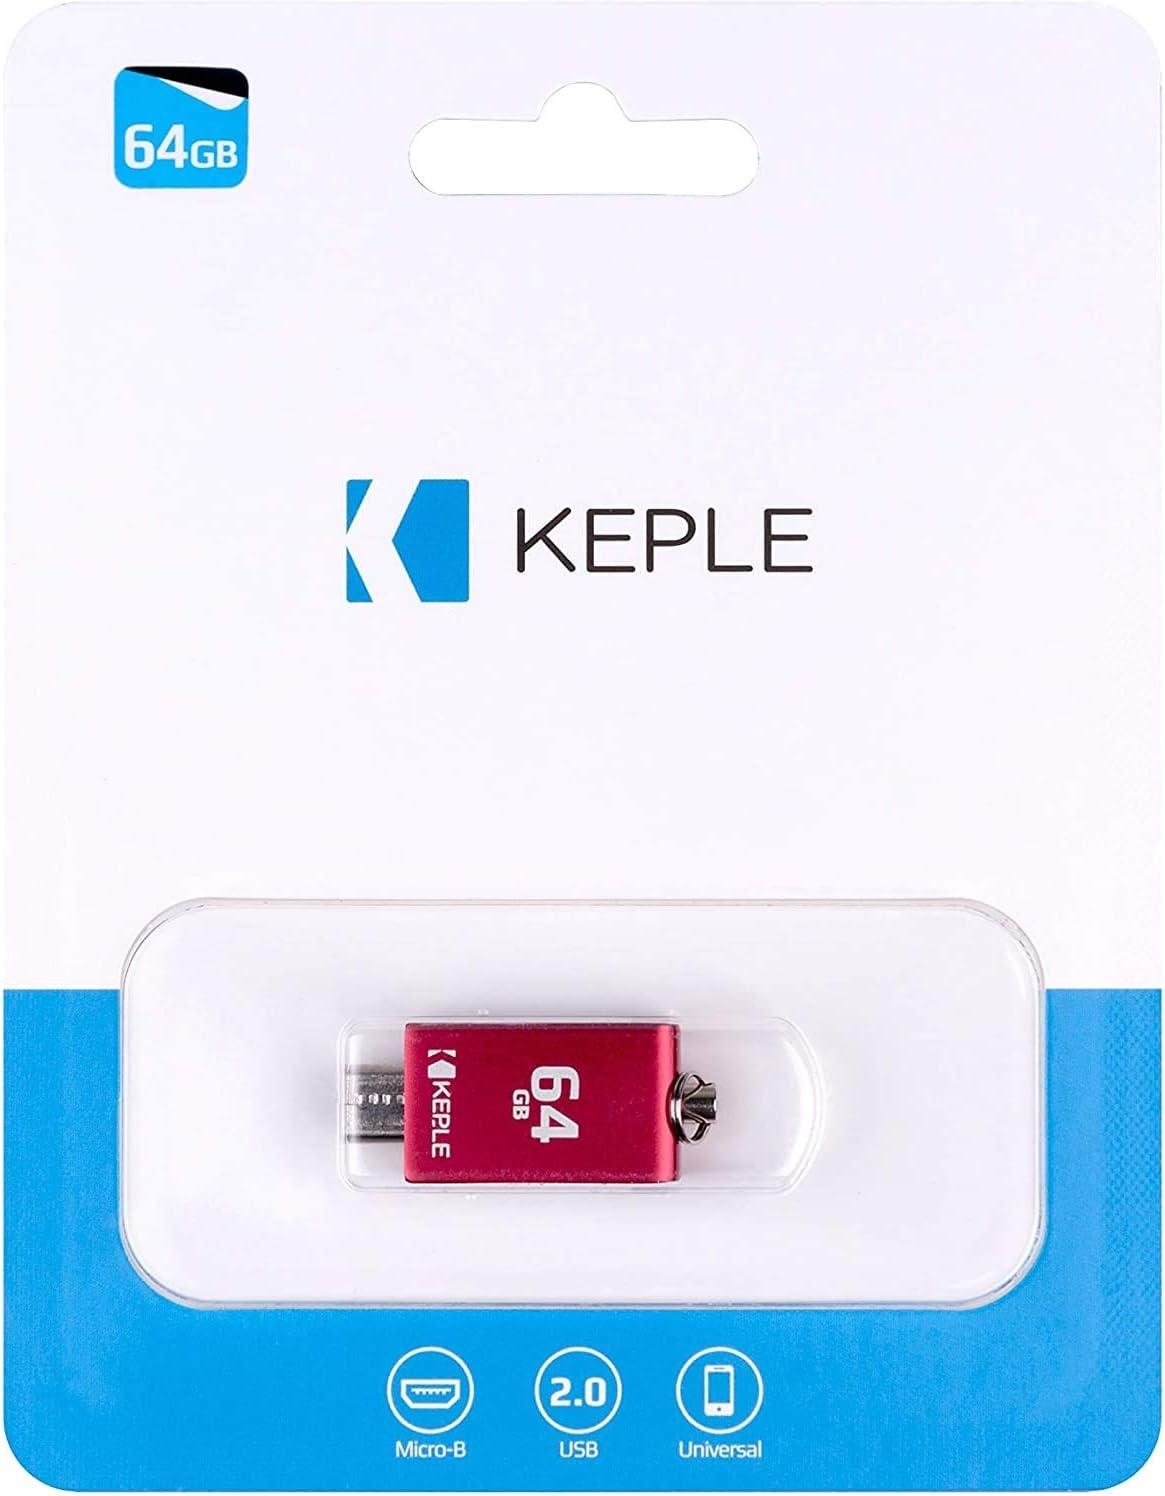 Z3 // Z3 Play G7 // G7 Plus Z//Z Force//Z Play Z2 // Z2 Force X4 USB Memory Stick 128GB USB C 3.0 High Speed Dual OTG Pen Flash Drive Compatible with Motorola Moto M 128 GB Type C Thumb Drive